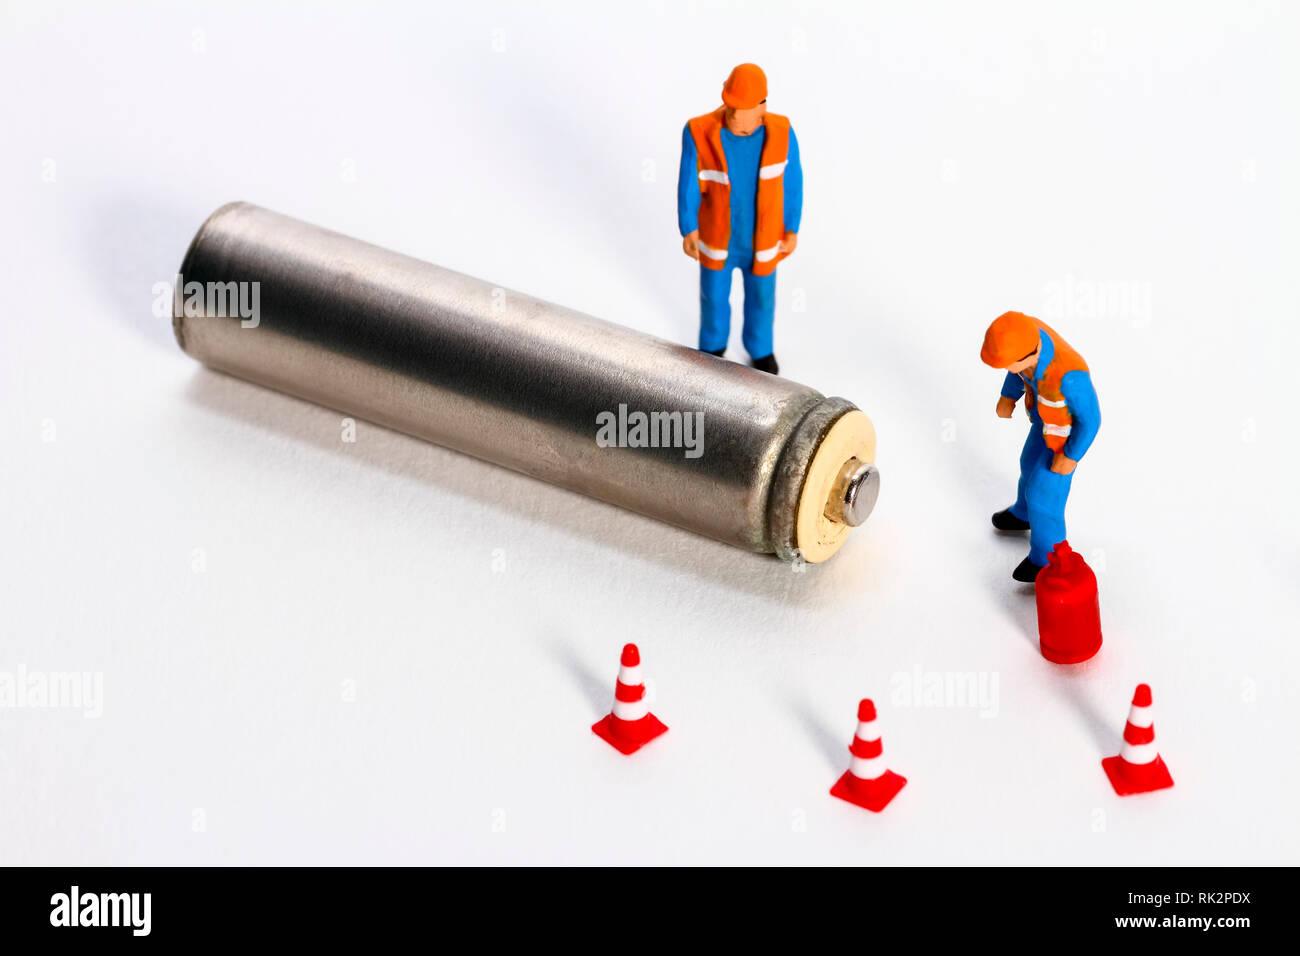 Diorama concettuale immagine di gestione dei rifiuti costituiti da miniture figura operai guardando una batteria Immagini Stock